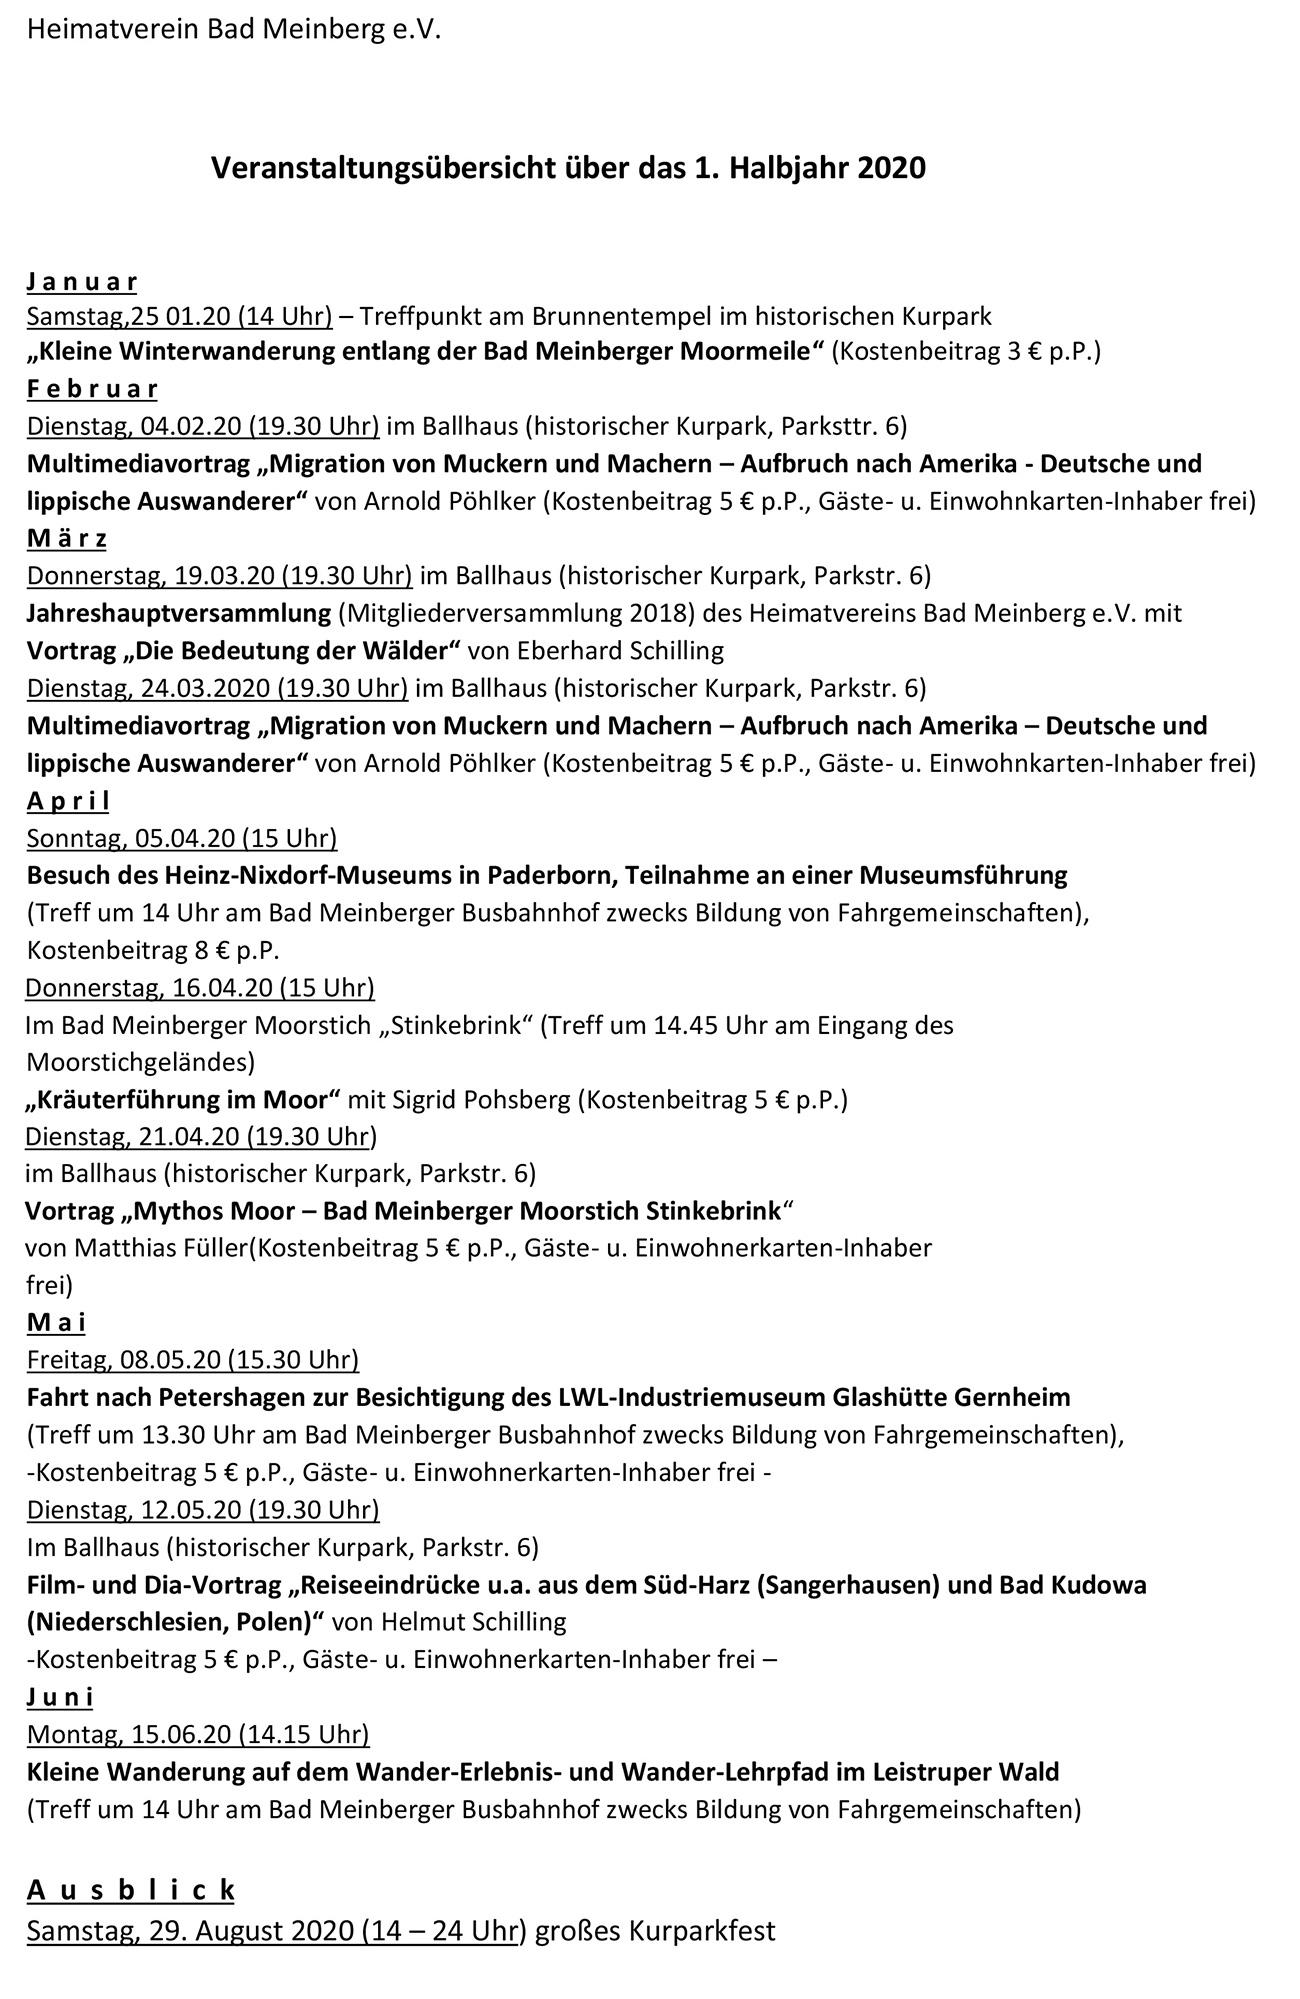 HV-B-Mbg--Veranstaltungen-1--Hj--2020